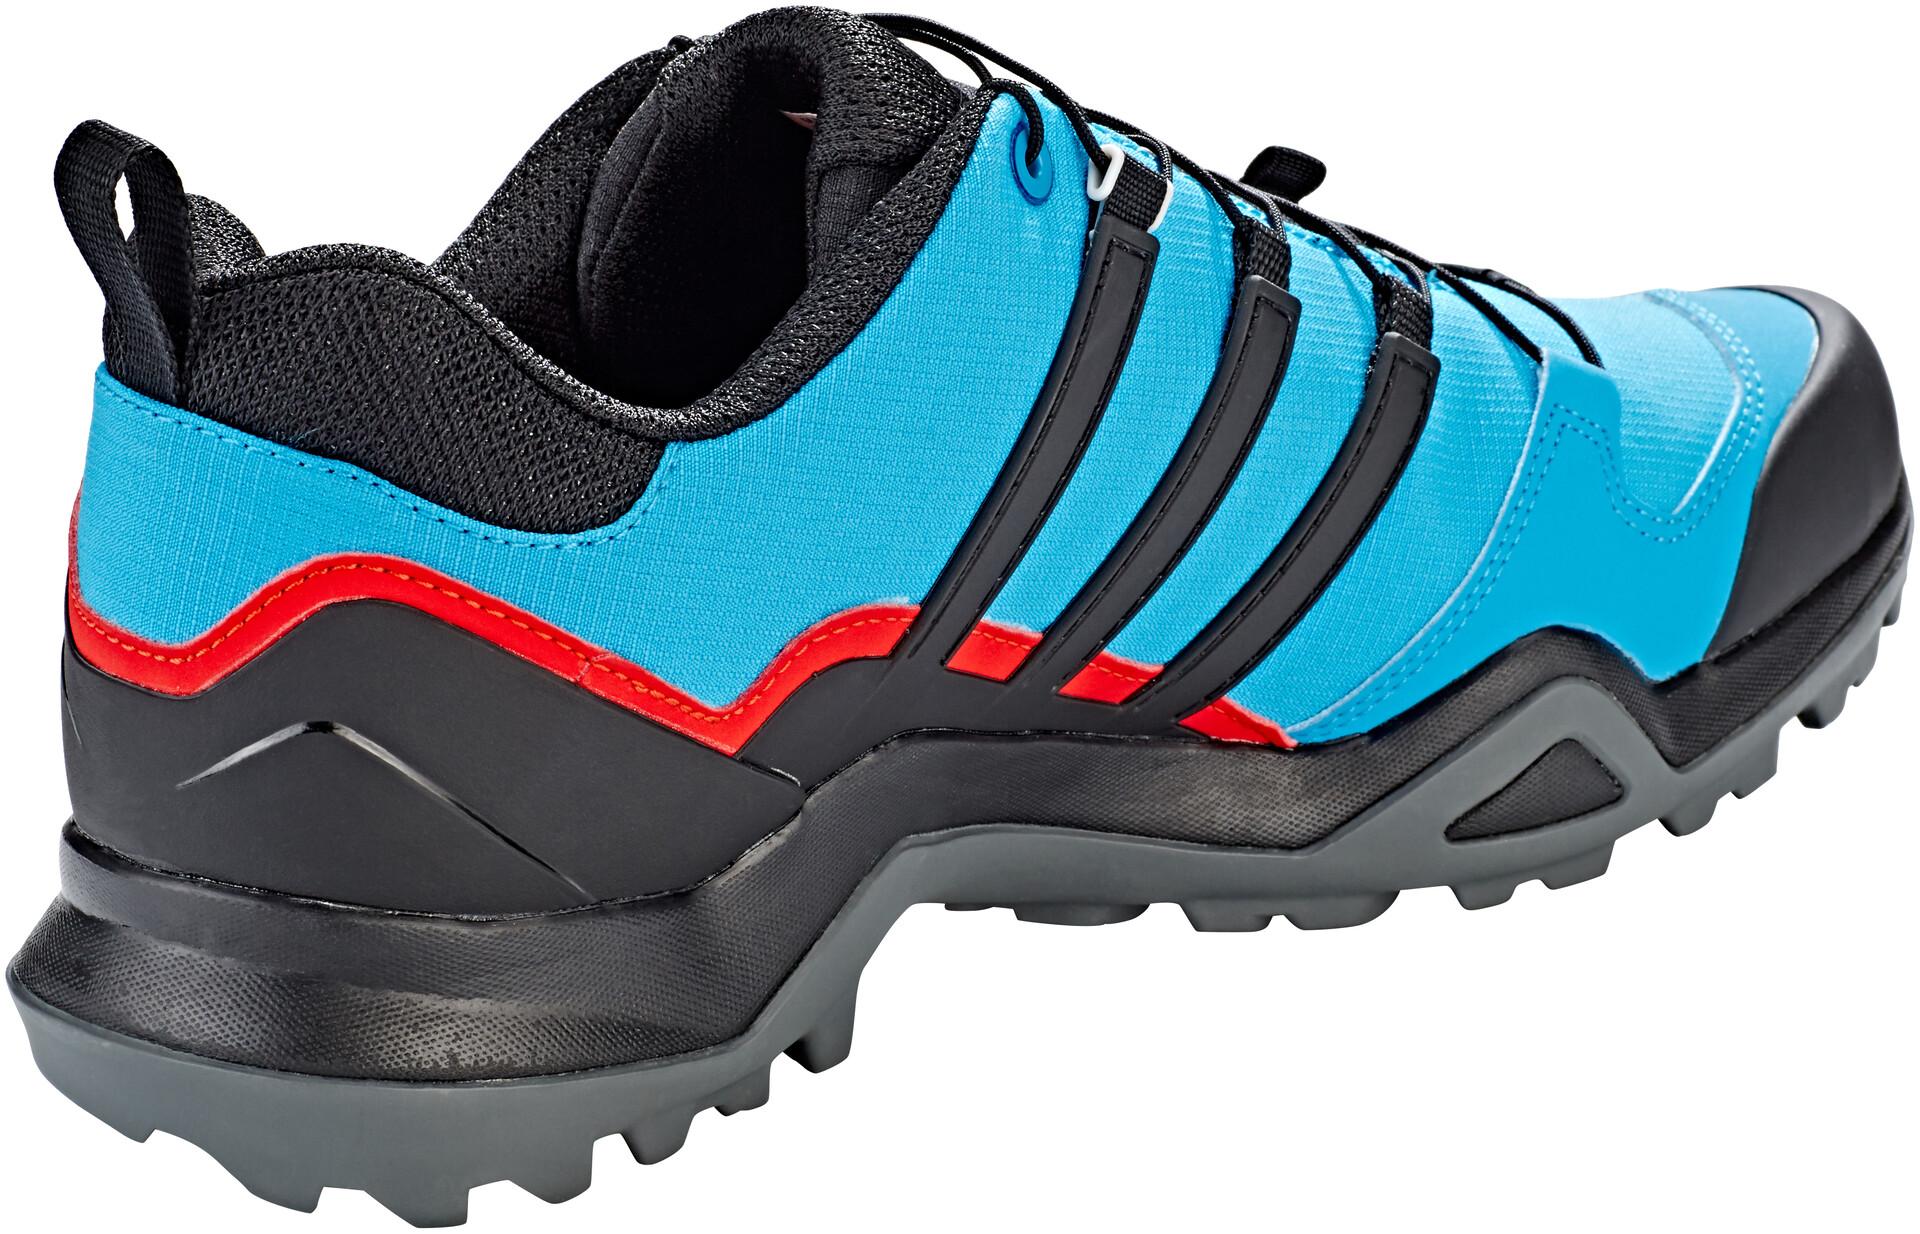 adidas TERREX Swift R2 Chaussures Homme, shock cyancore